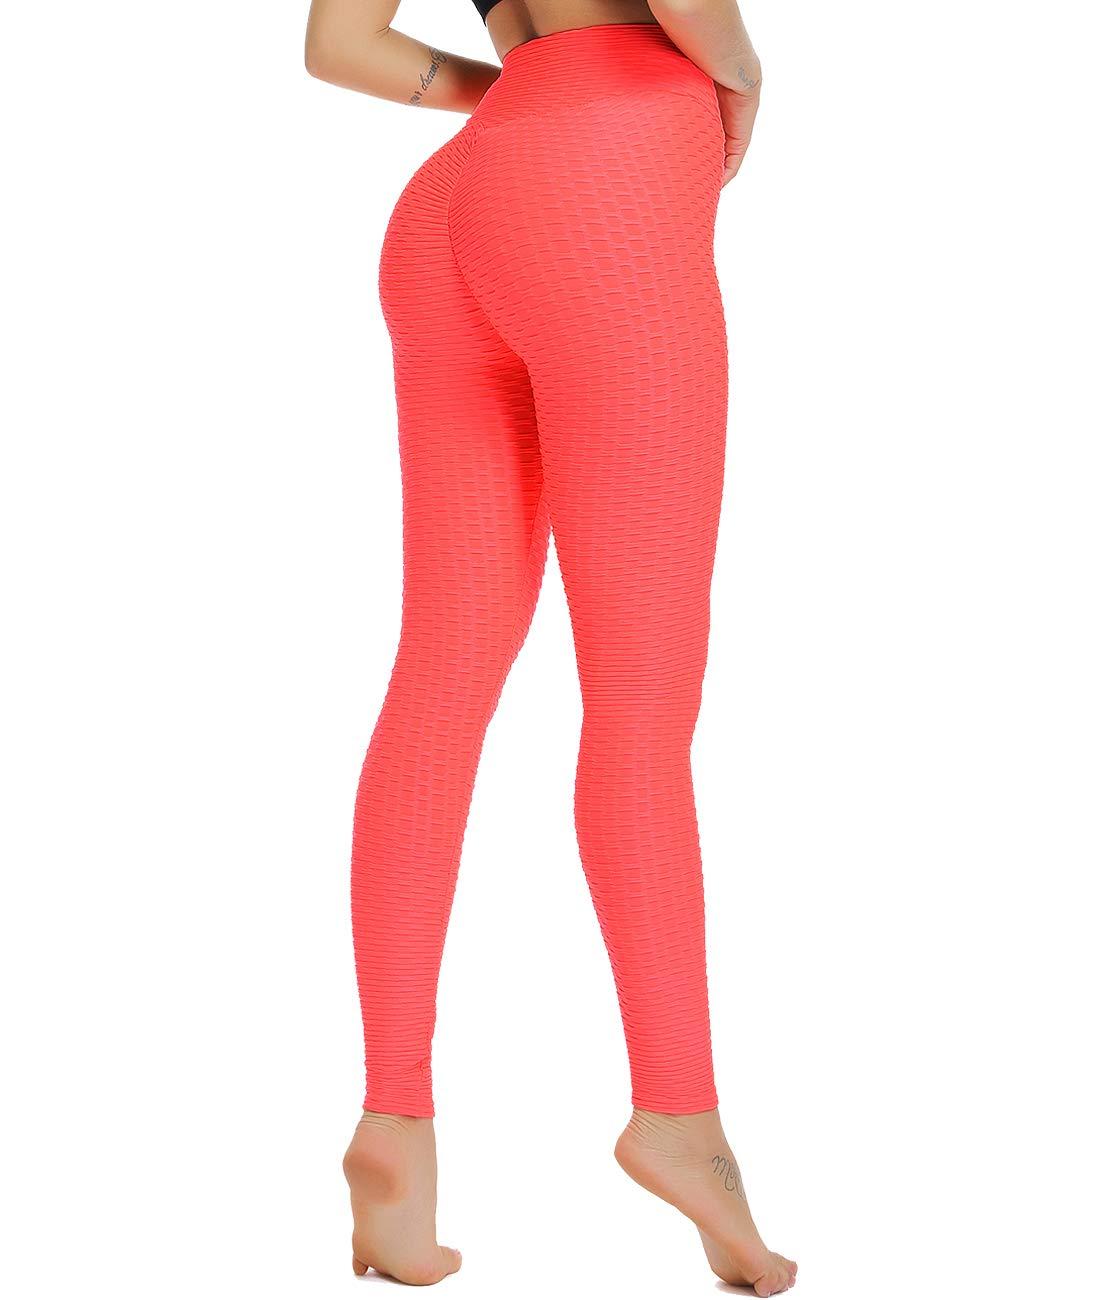 SEASUM Donna Dimagrante Patchwork Mesh Capri Leggings Morbido Running Fitness Yoga Pantaloni